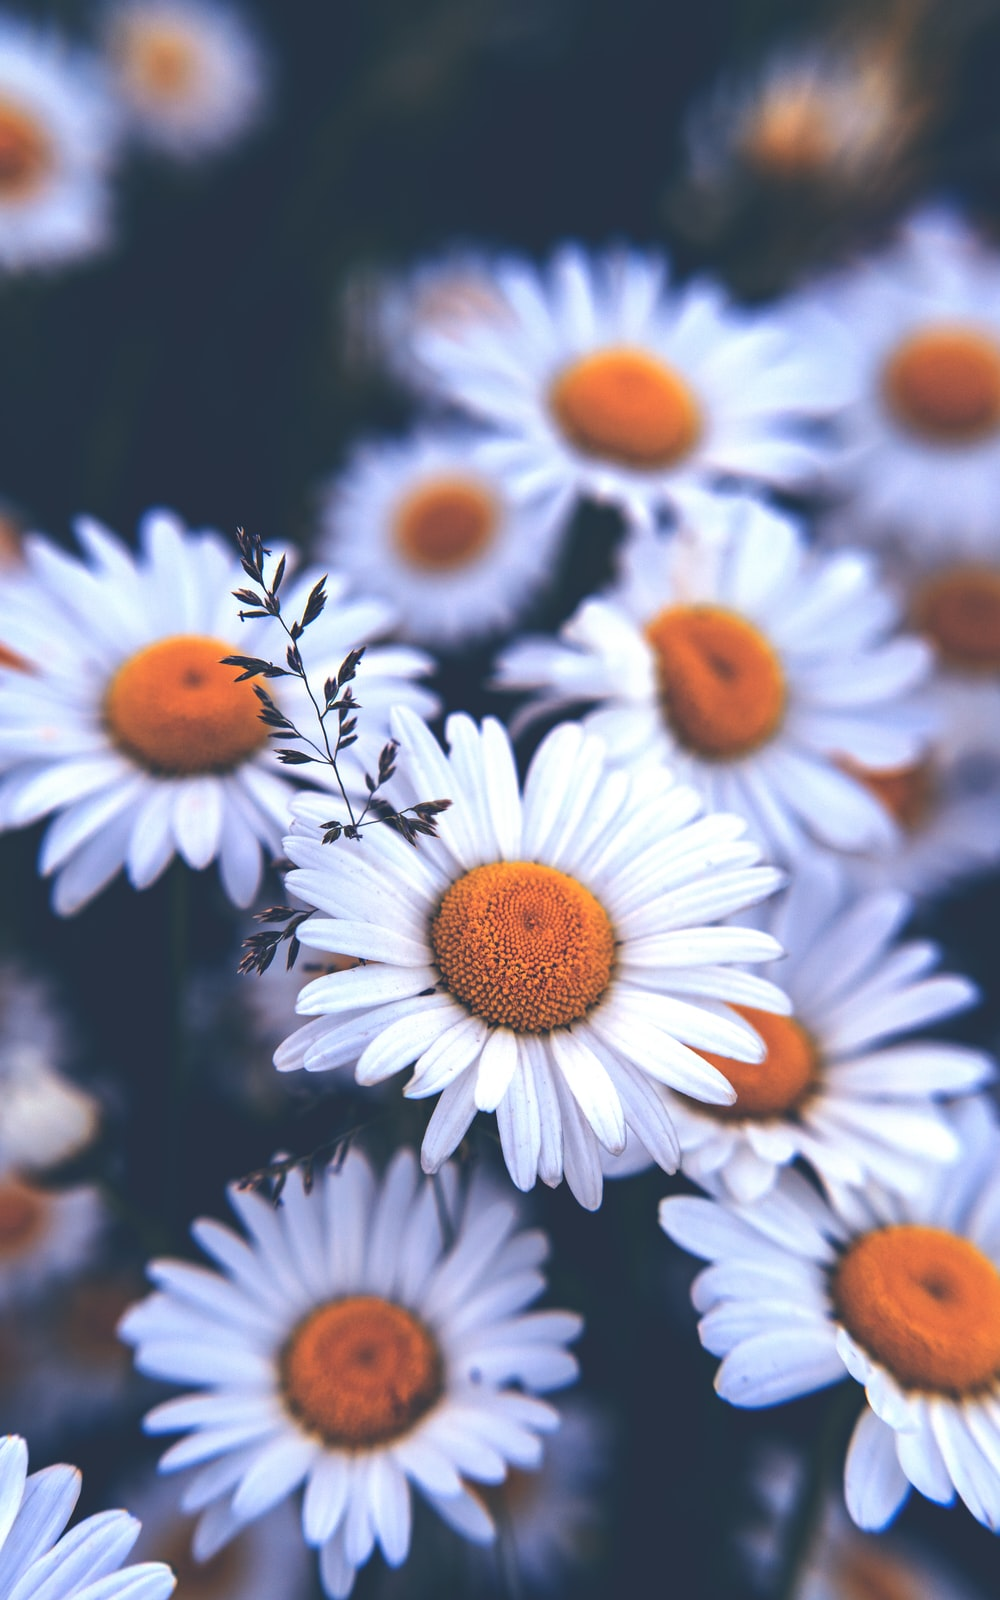 white and orange daisy flowers